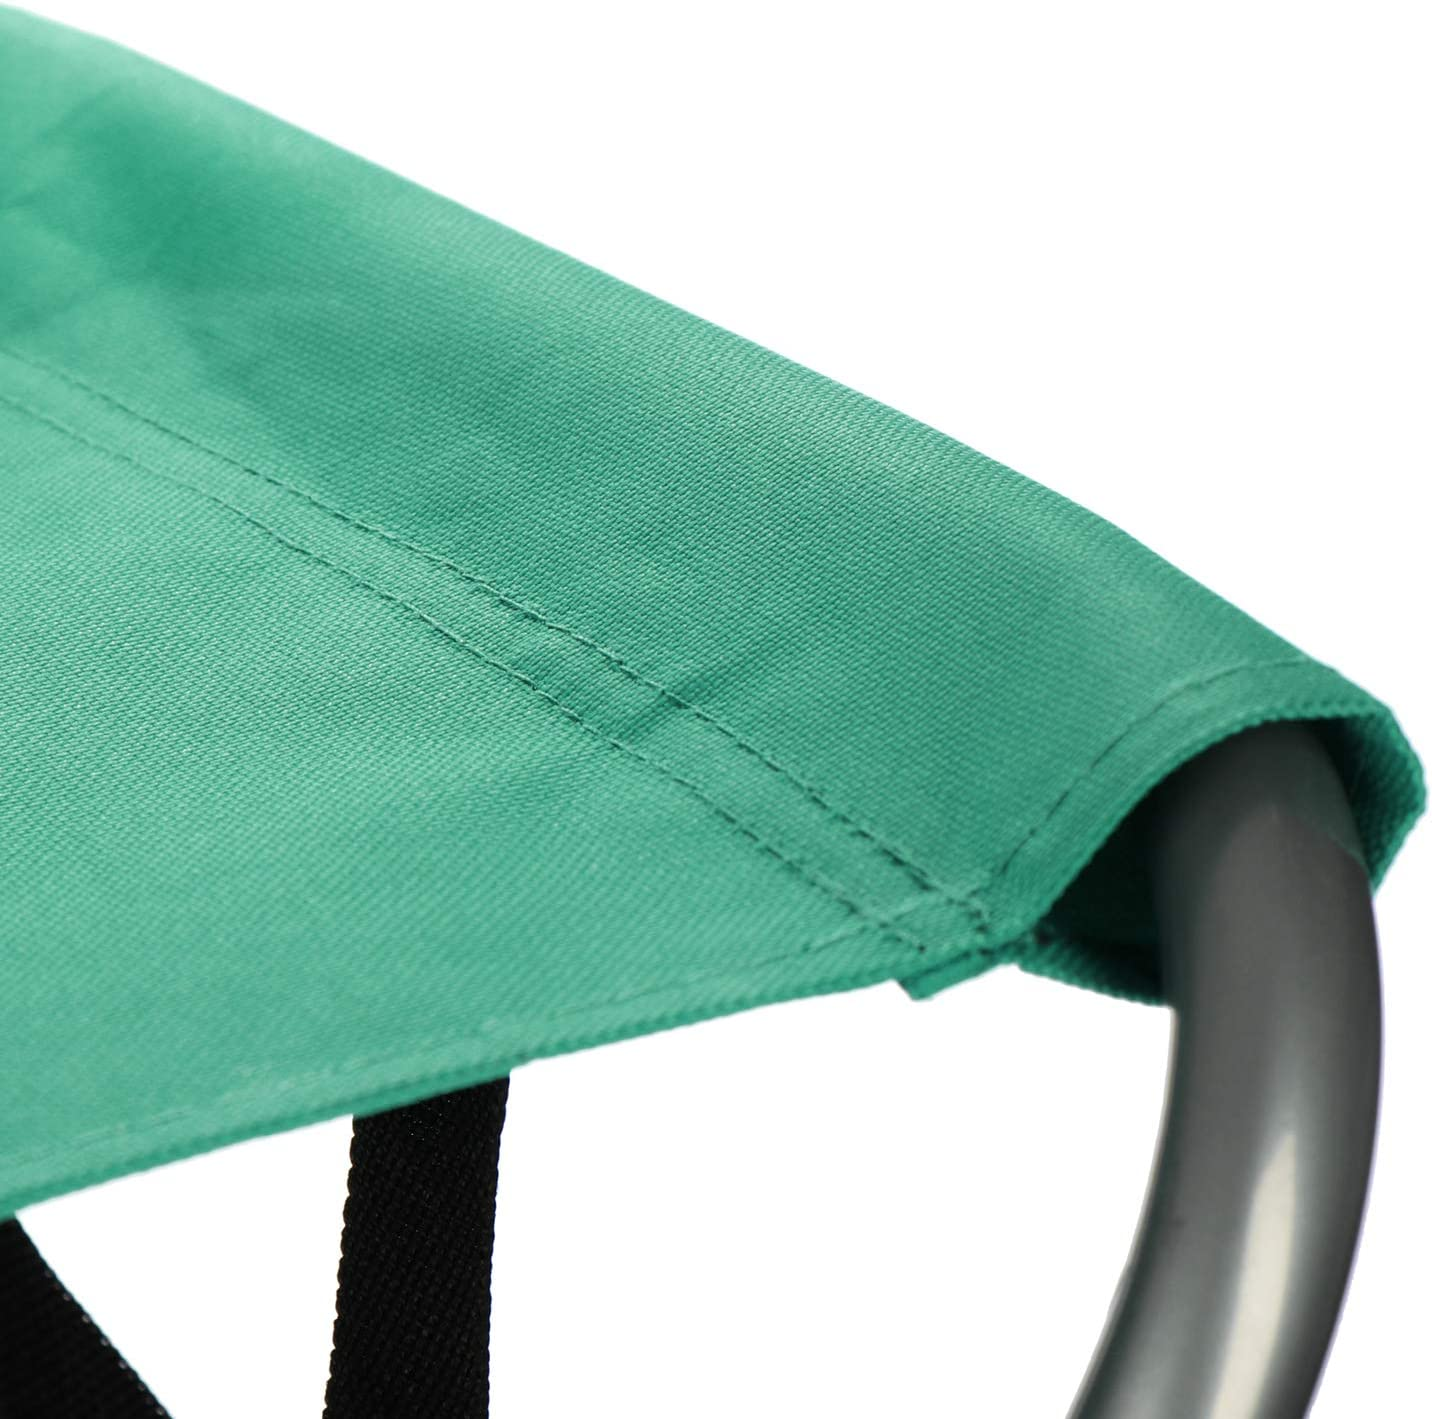 Verde Taburete Plegable port/átil Senderismo Picnic com-four/® Taburete de Camping Plegable Pescar Silla Plegable peque/ña para Acampar Playa